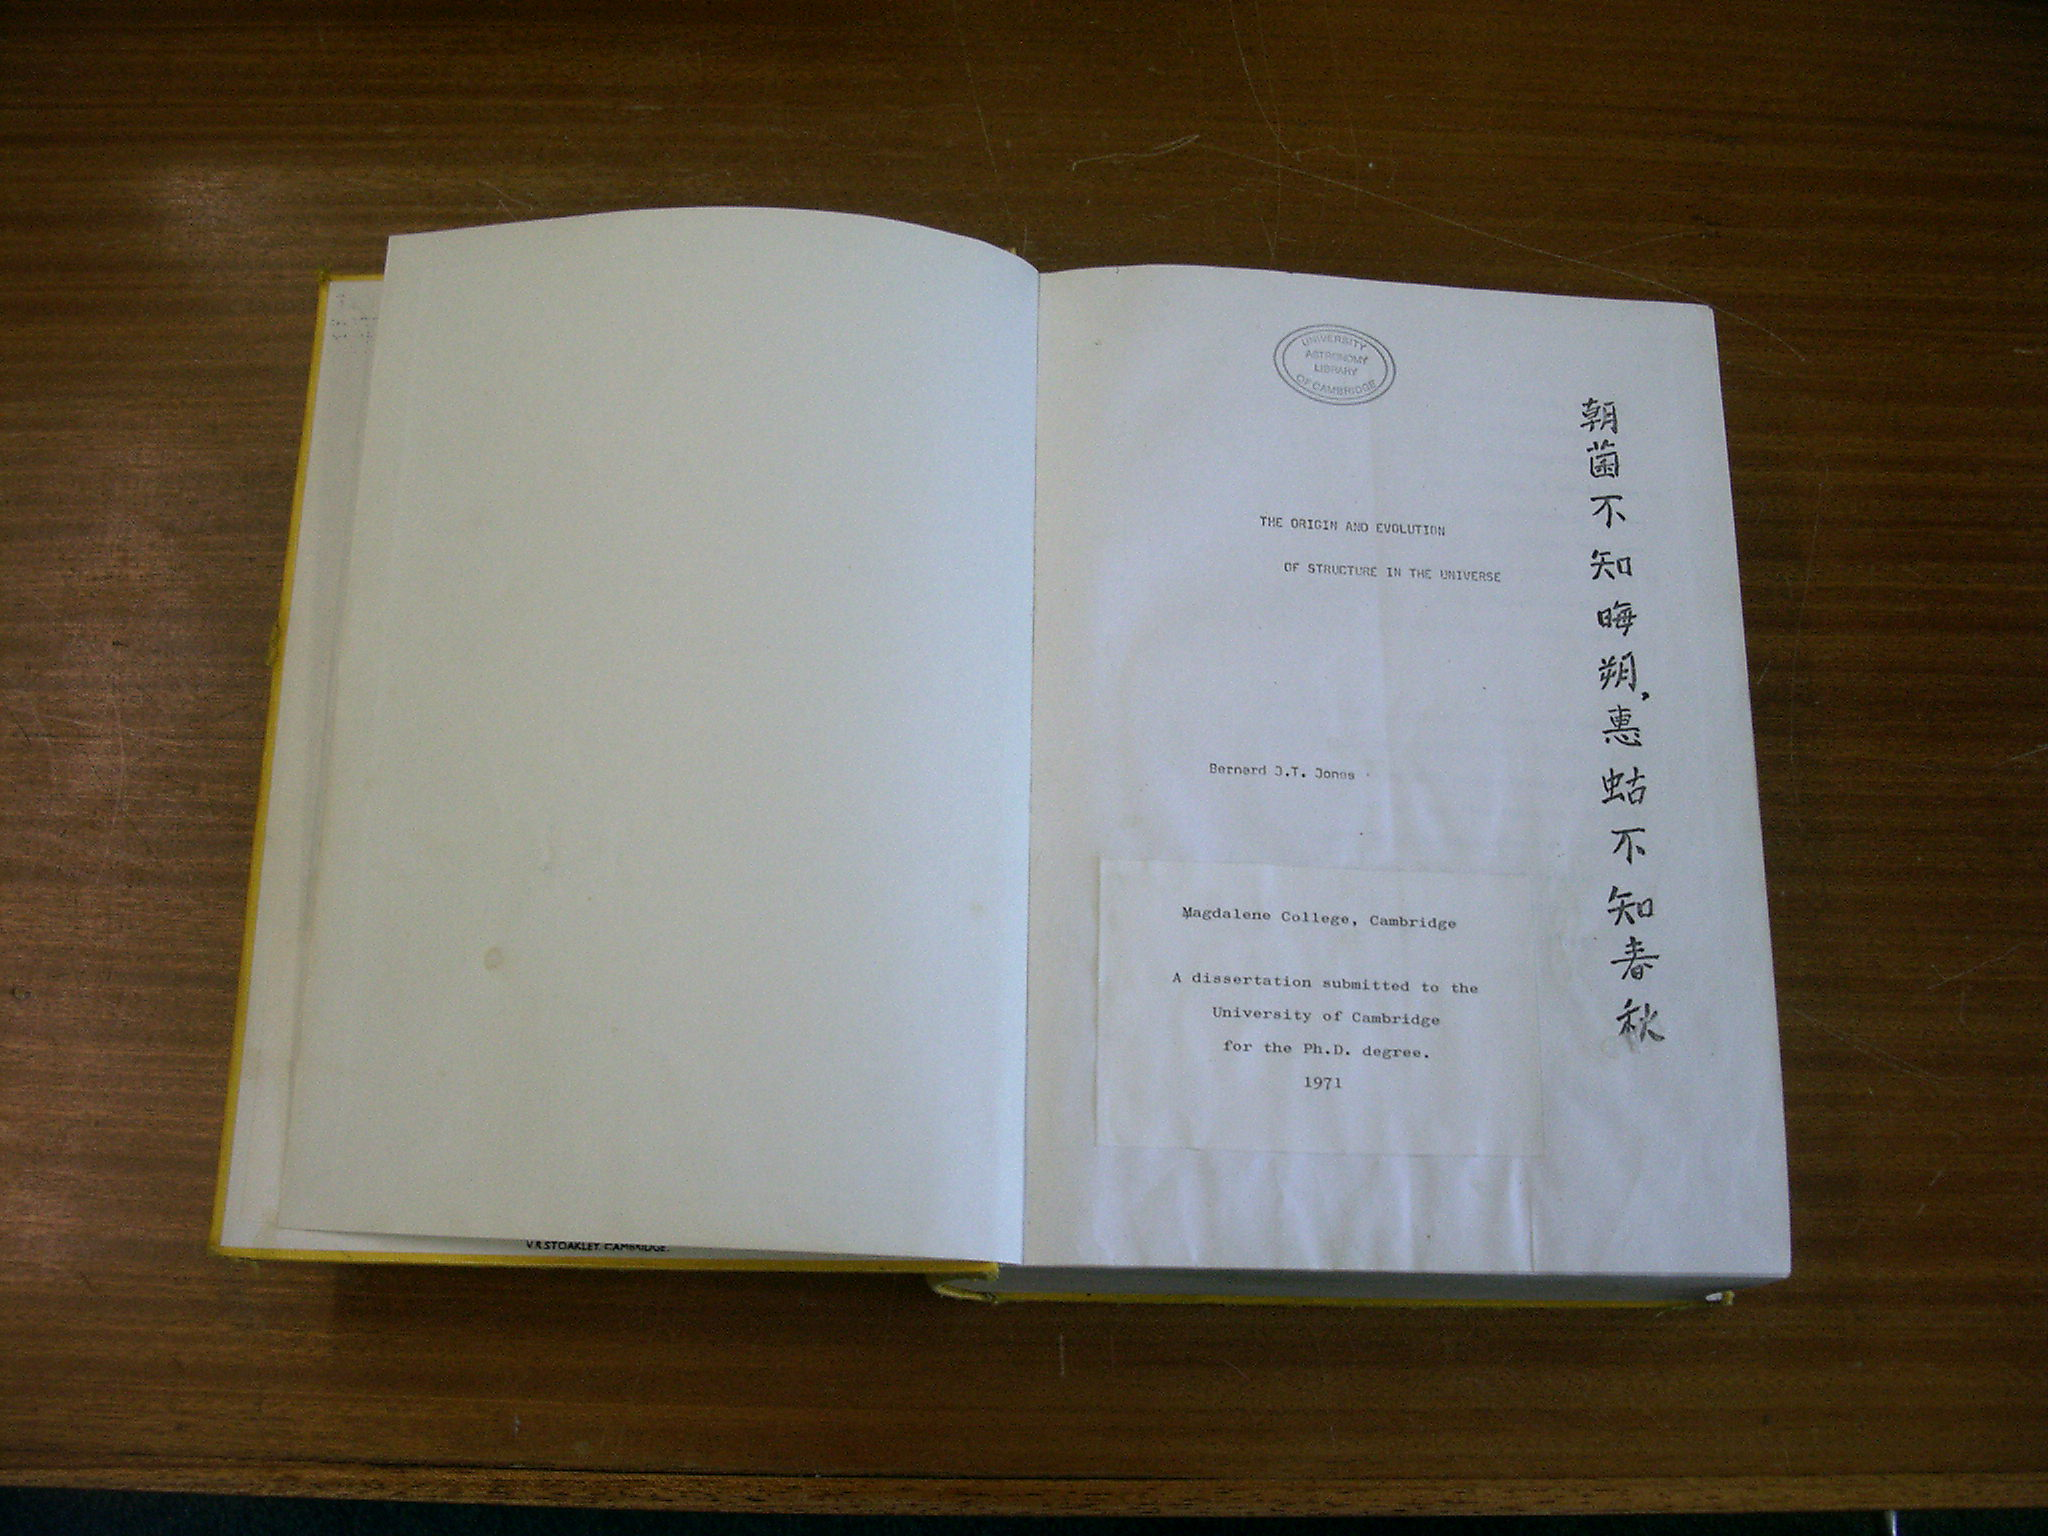 Dissertation binding service nottingham